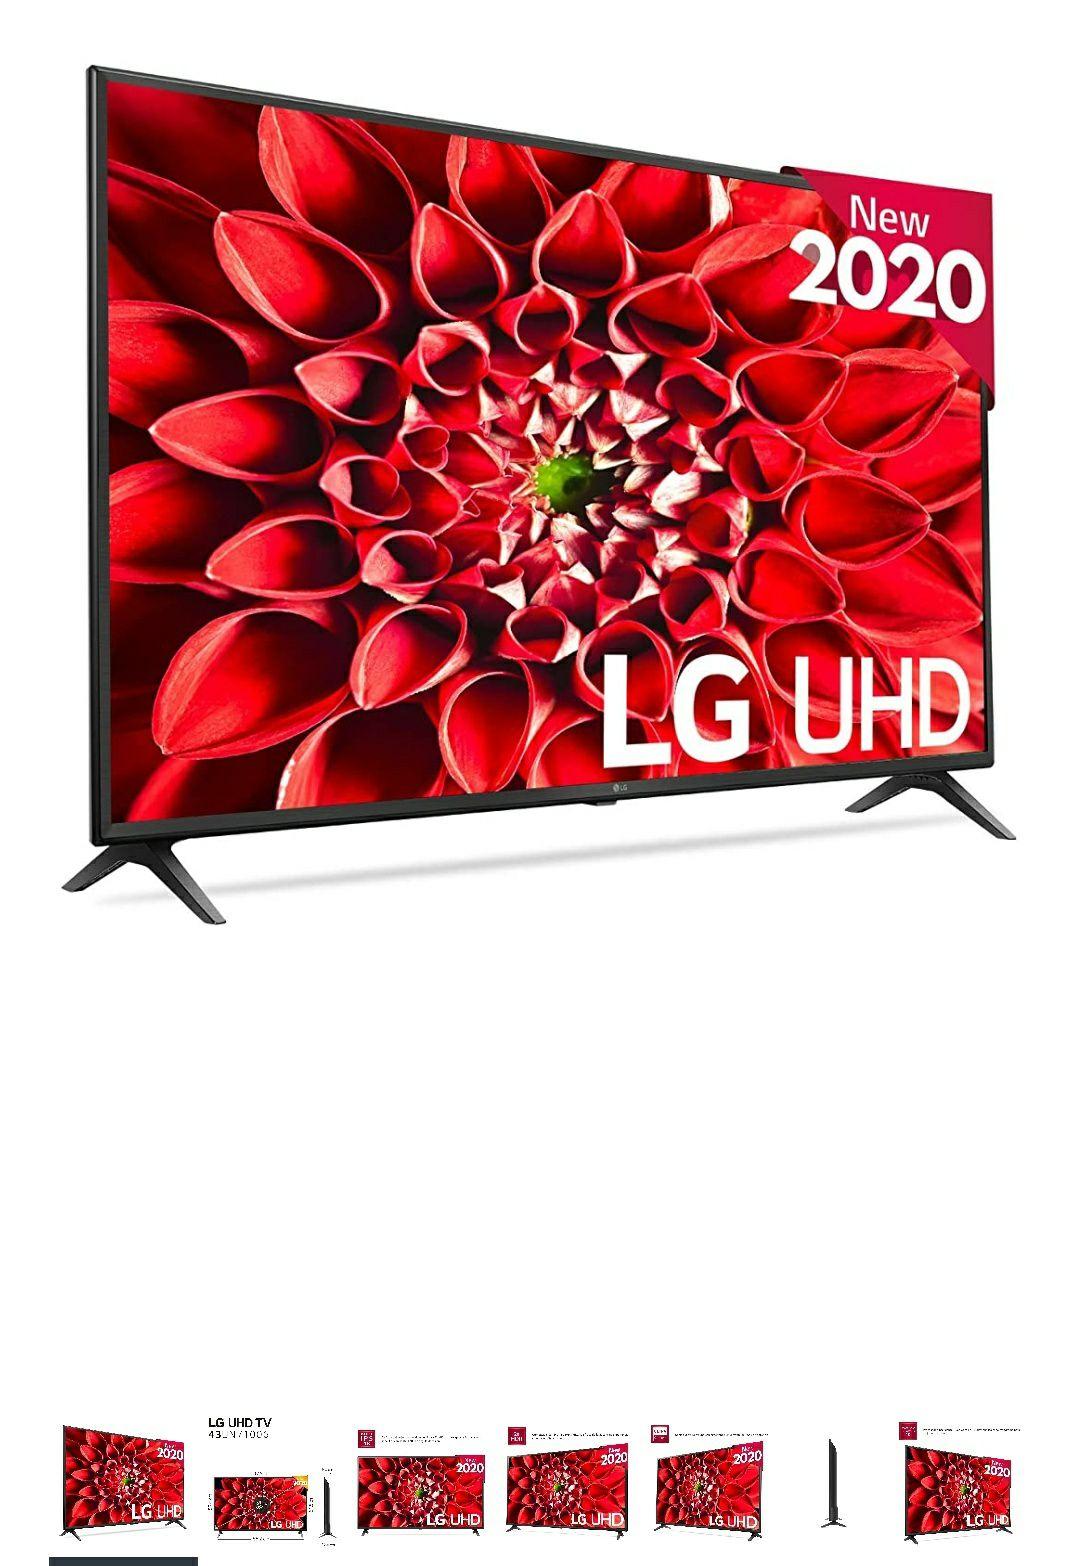 "LG 43UN7100 - Smart TV 4K UHD 108 cm (43"") Posible minimo"